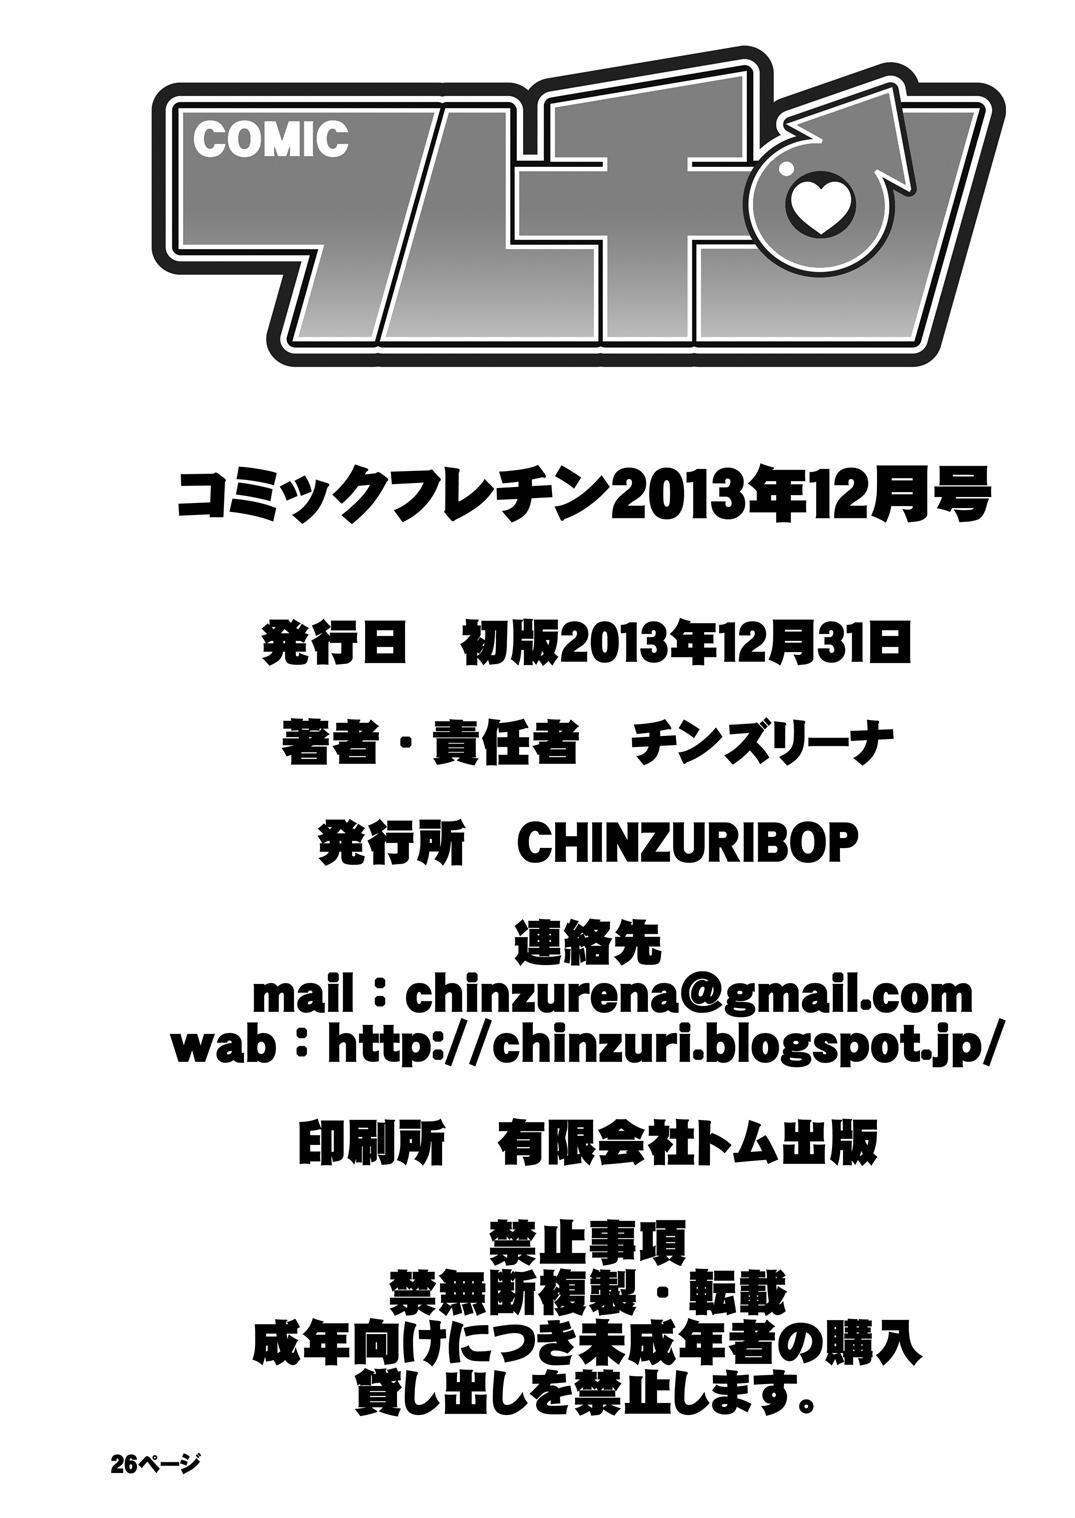 [CHINZURI BOP (Chinzuriina)] Comic Furechin 2013-12 - Rui Feminization Squad (Gatchaman Crowds) [English] =SW= [Digital] 25